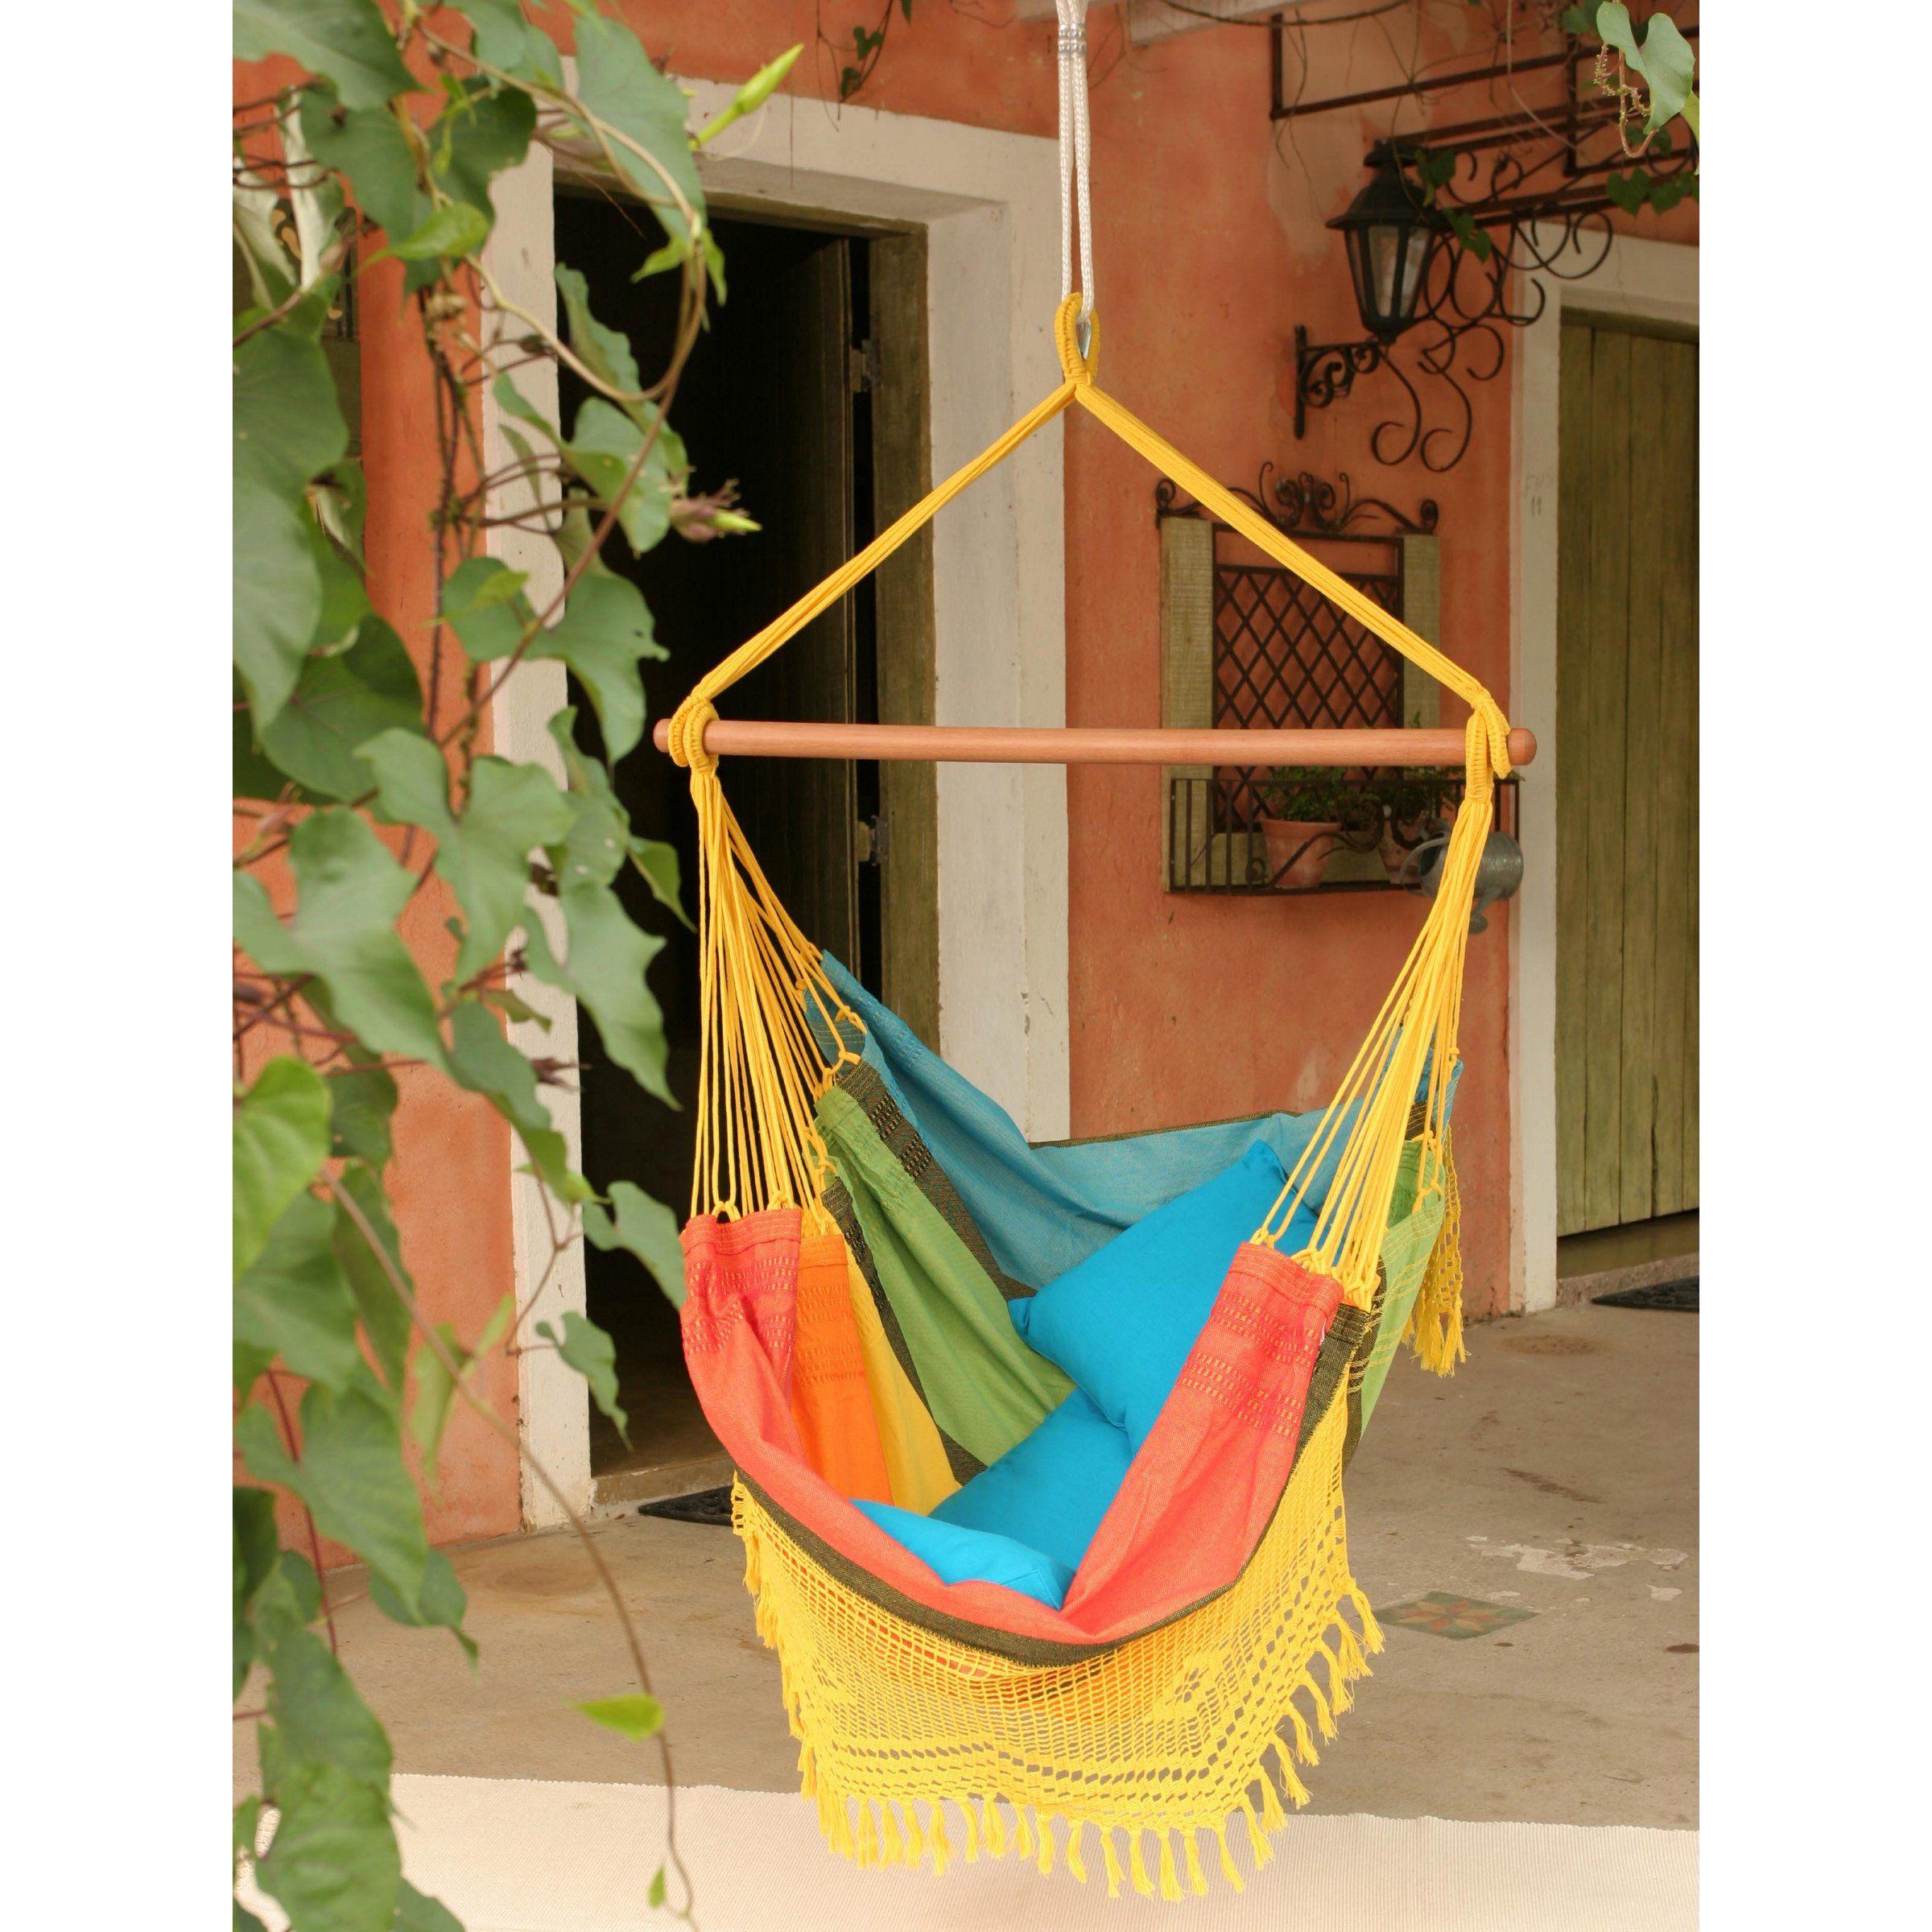 Brazilian cotton fabric hammock chair with fringe hammock chairs